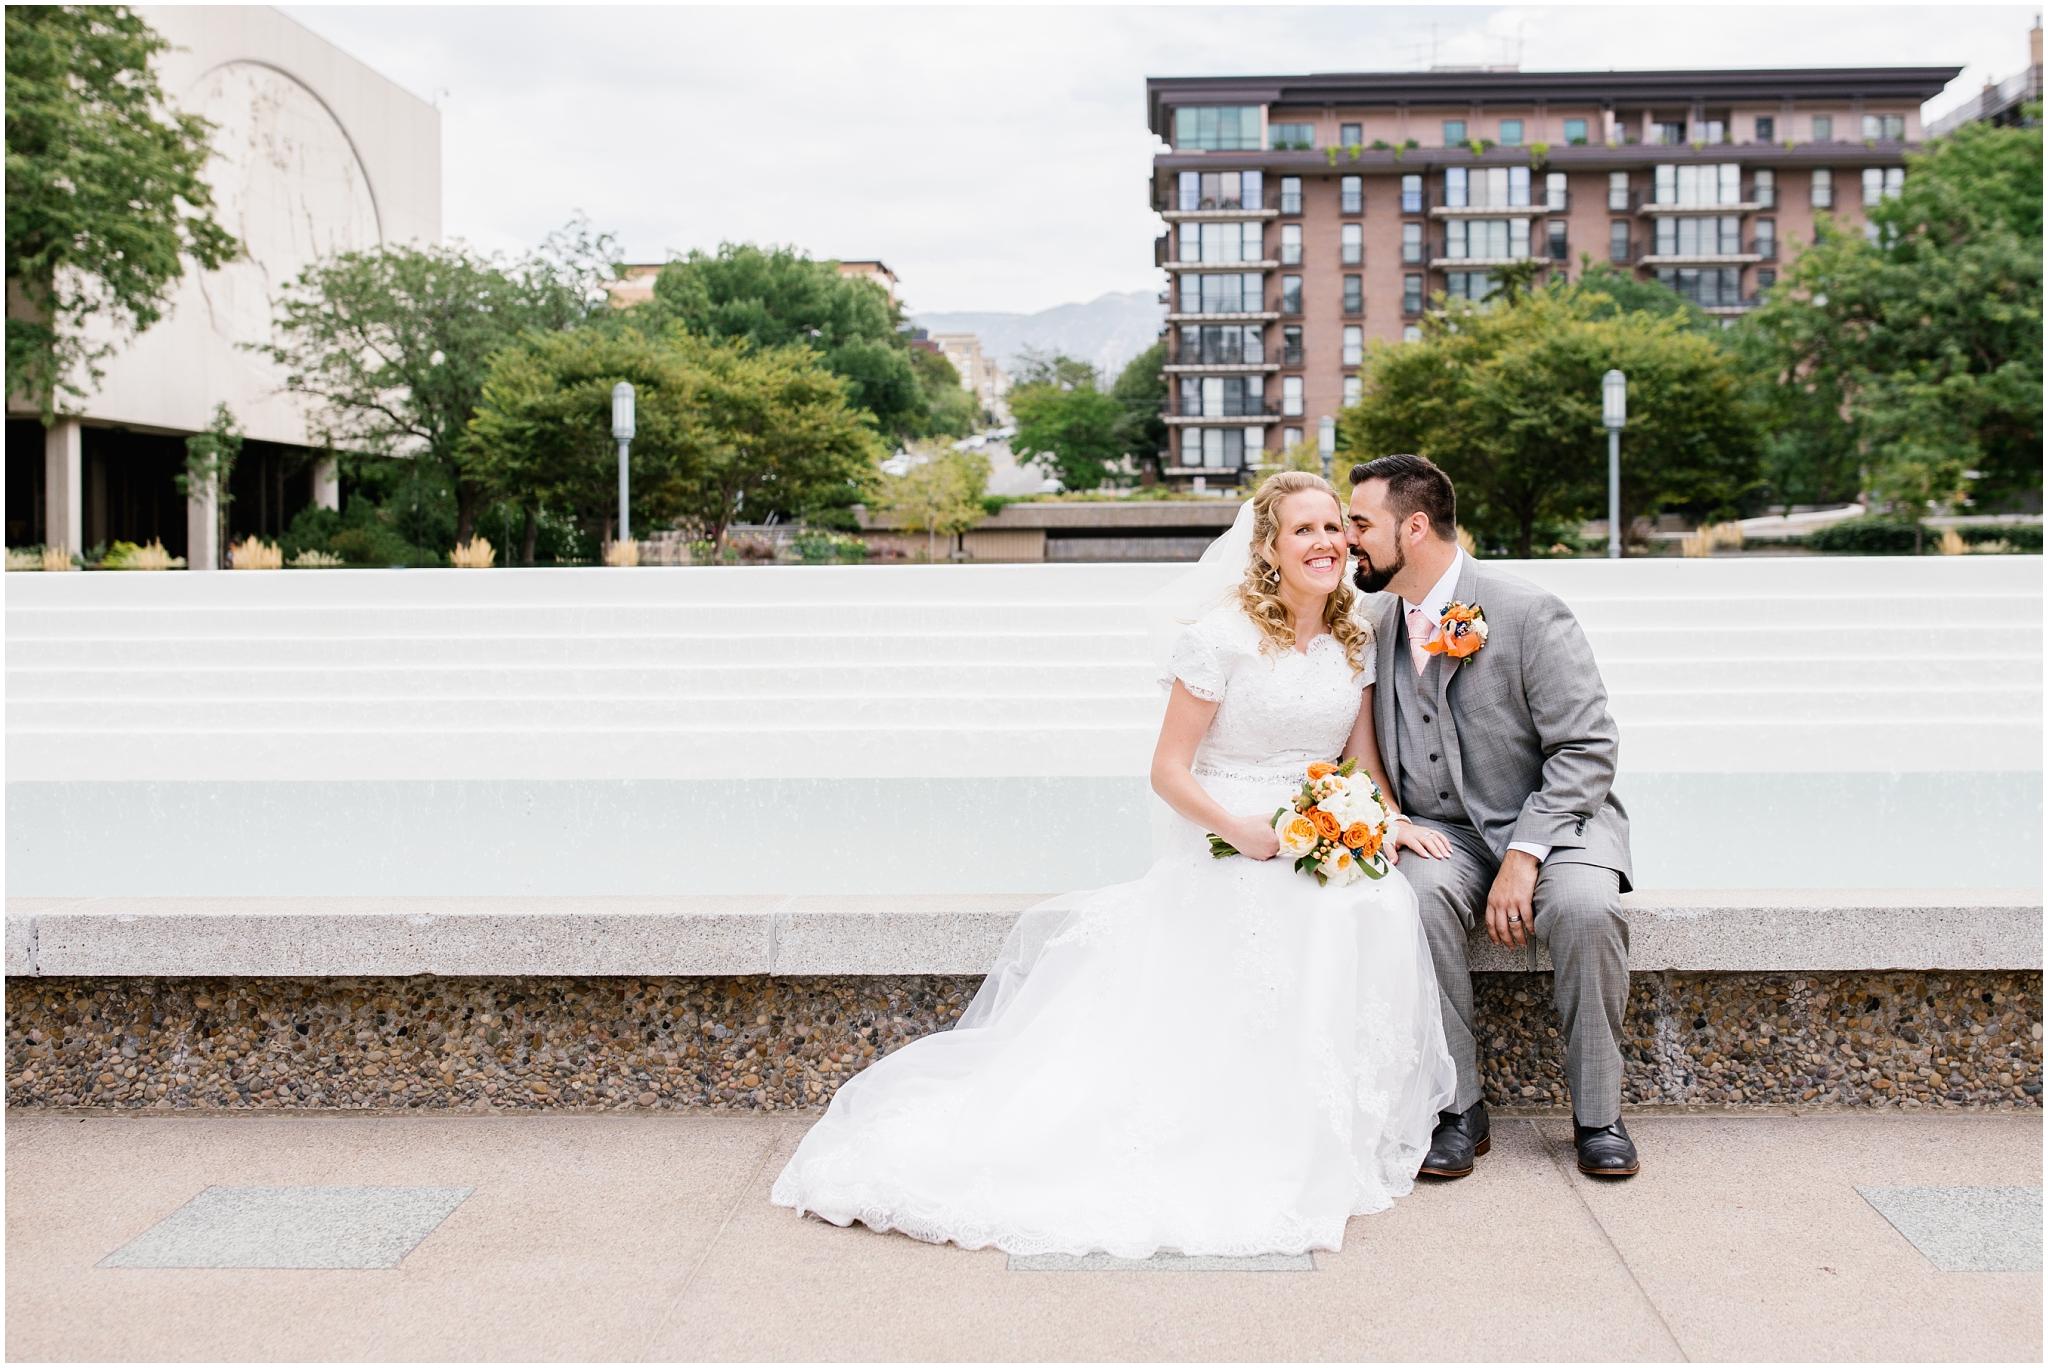 Justin and Melissa-184_Lizzie-B-Imagery-Utah-Wedding-Photographer-Salt-Lake-City-Temple-The-Grand-Ballroom.jpg